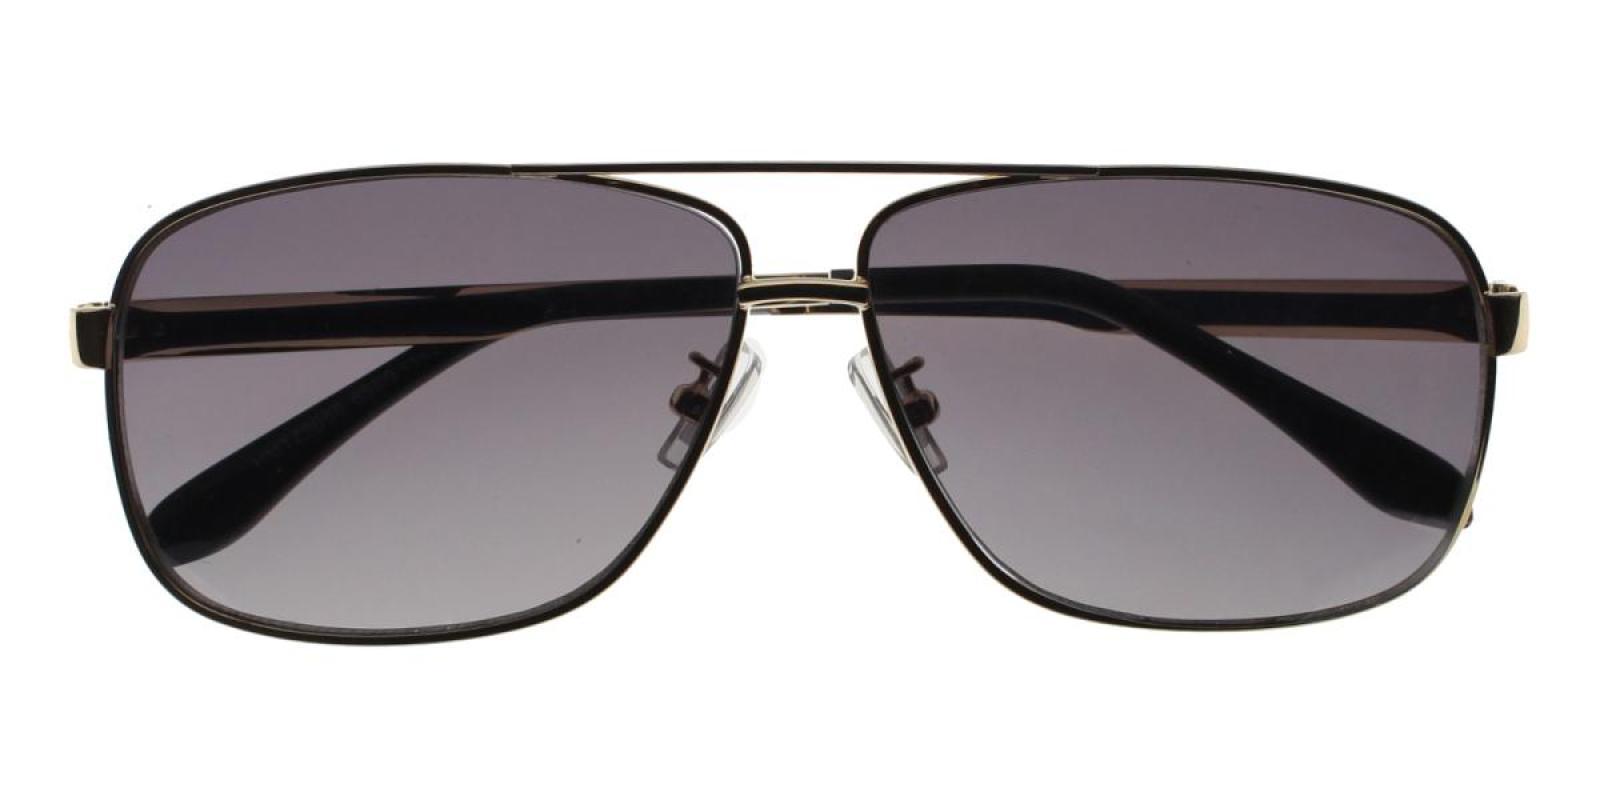 Marchisio-Gold-Aviator-Metal-Sunglasses-detail